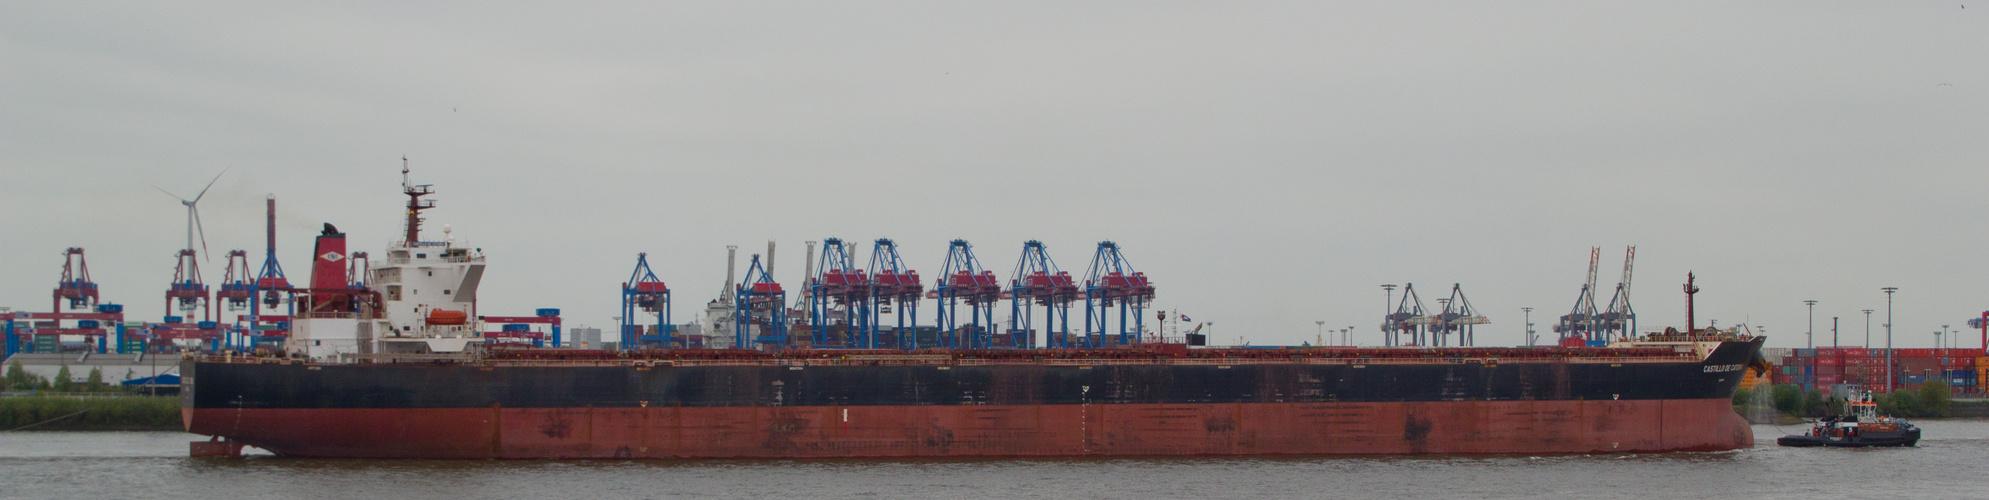 Hamburg Impressionen - Hamburger Hafen (35)